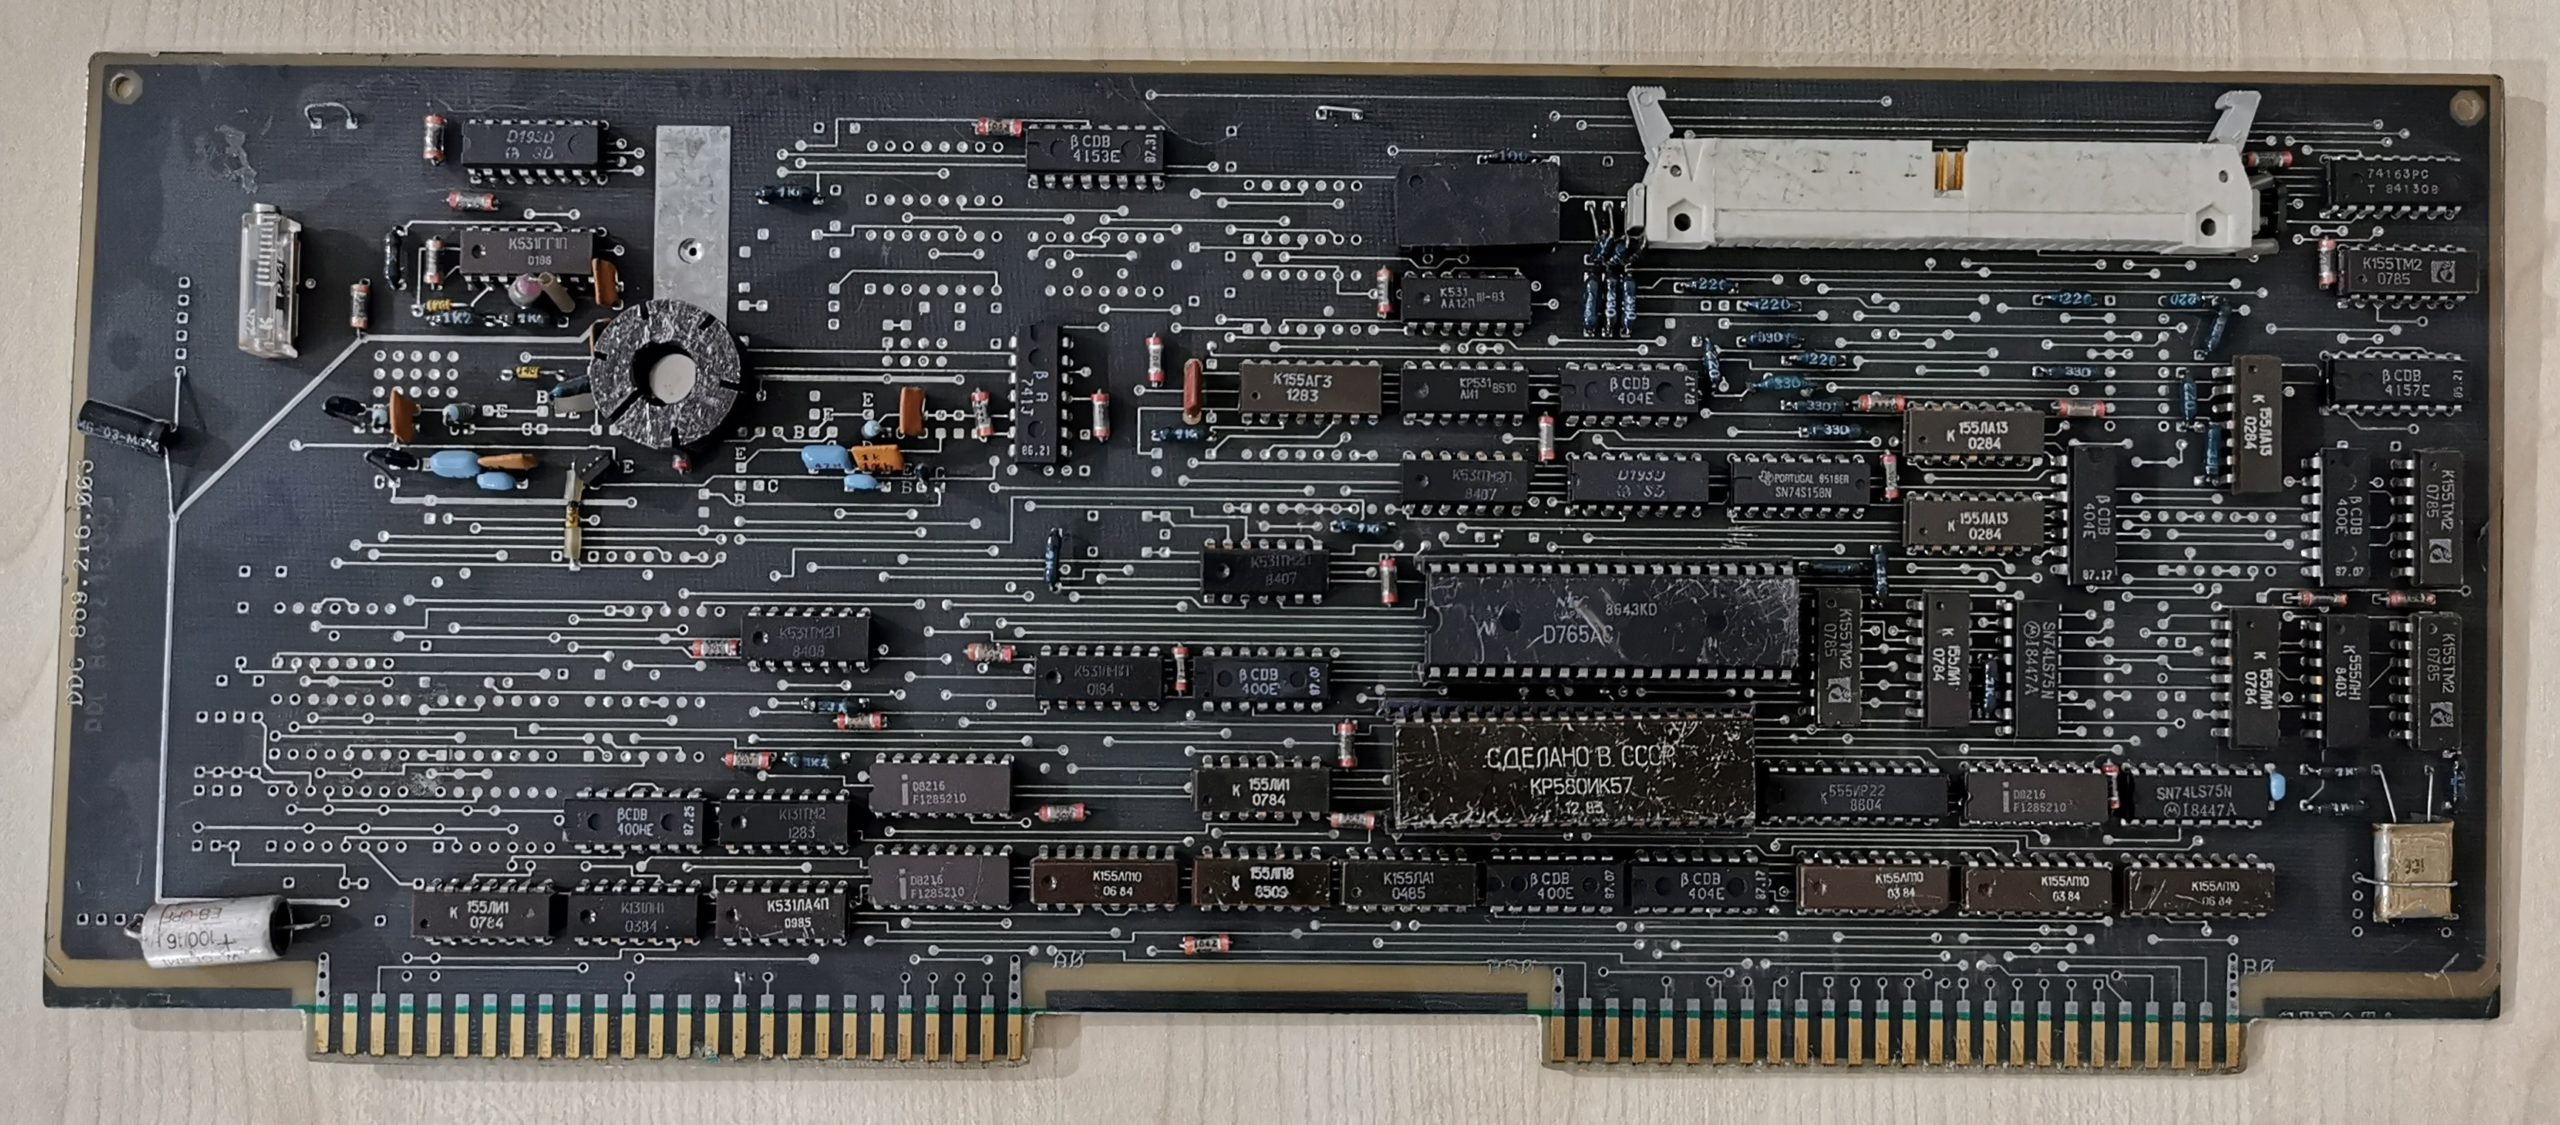 Controller floppy disk m118b